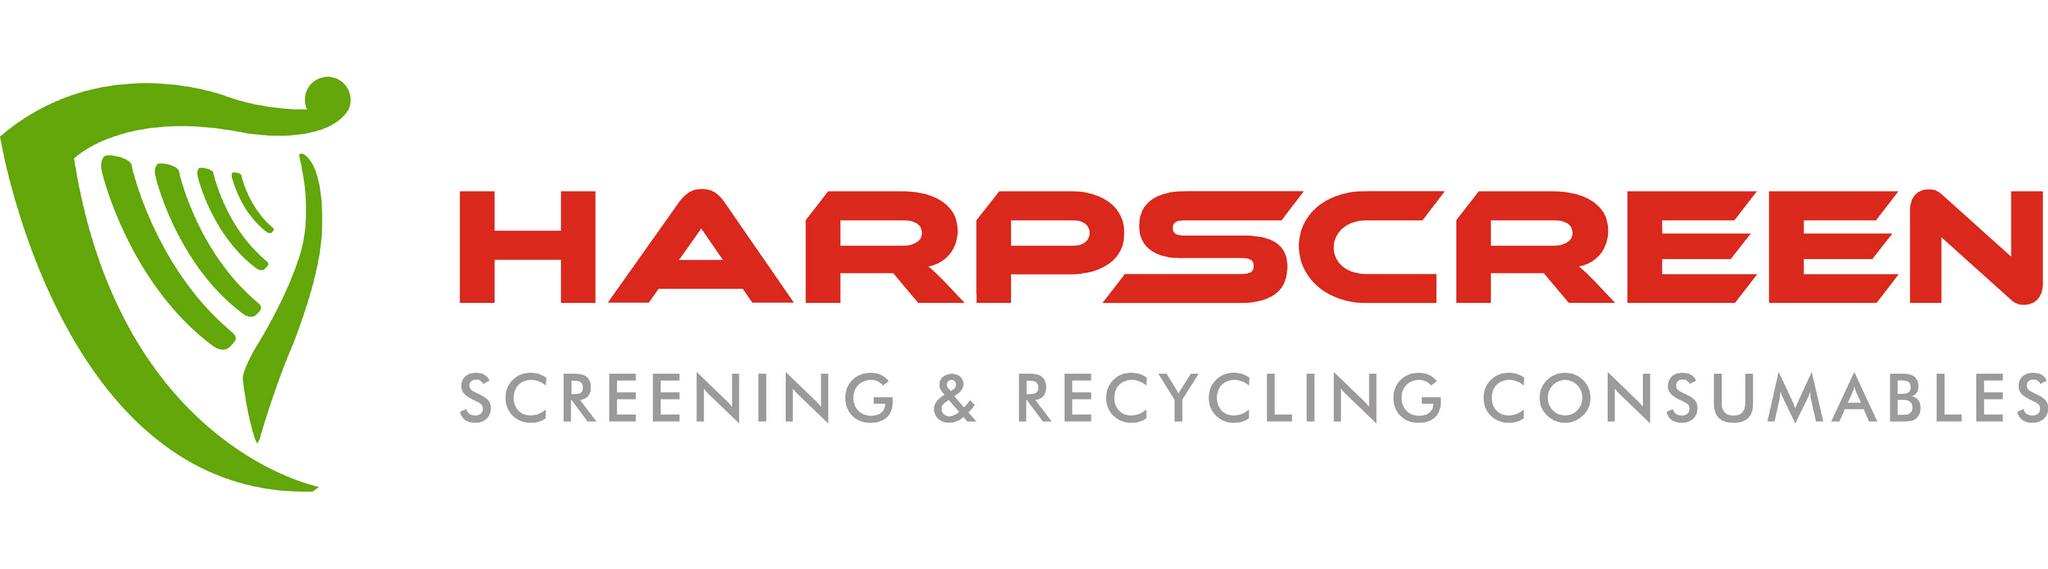 Harpscreen GB Ltd